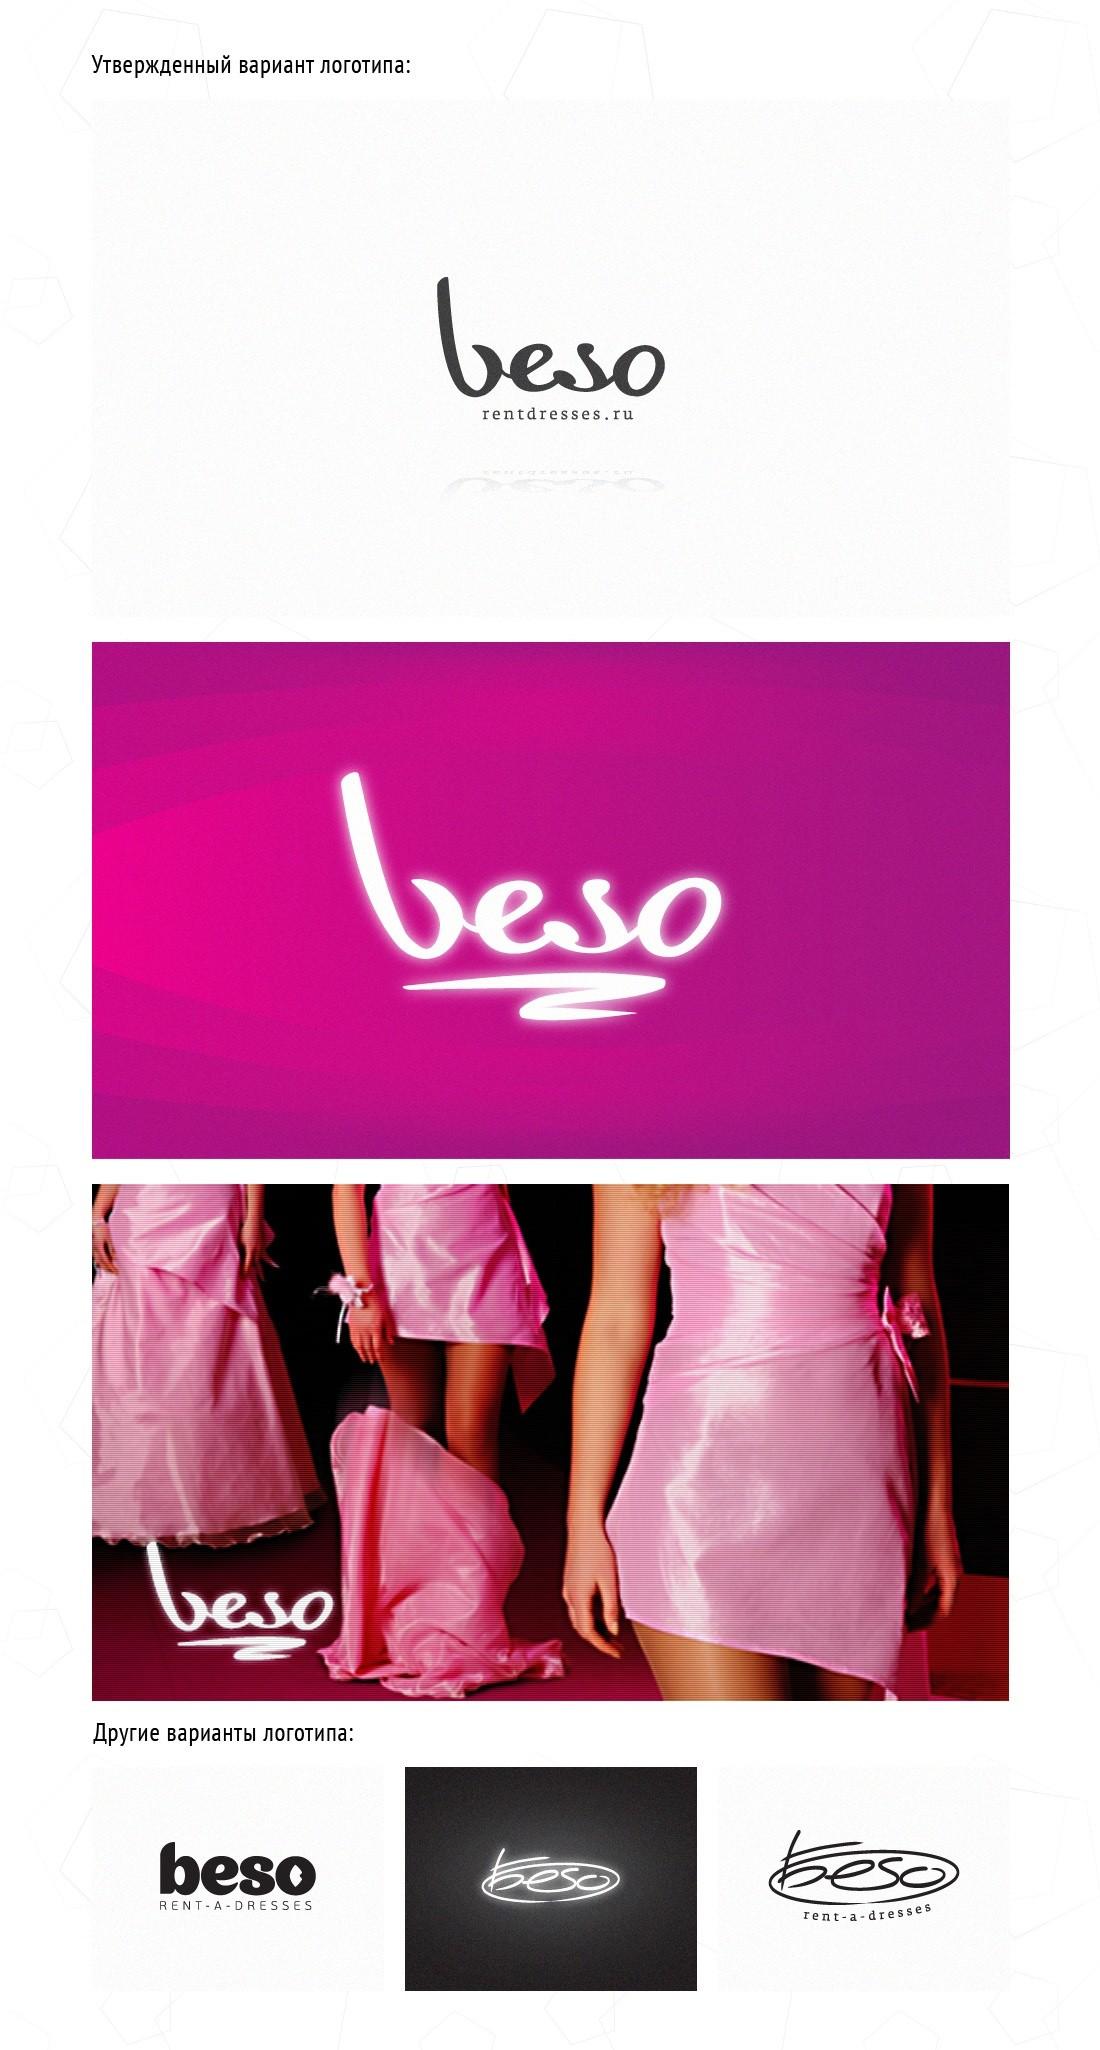 beso прокат платьев в санкт-петербурге